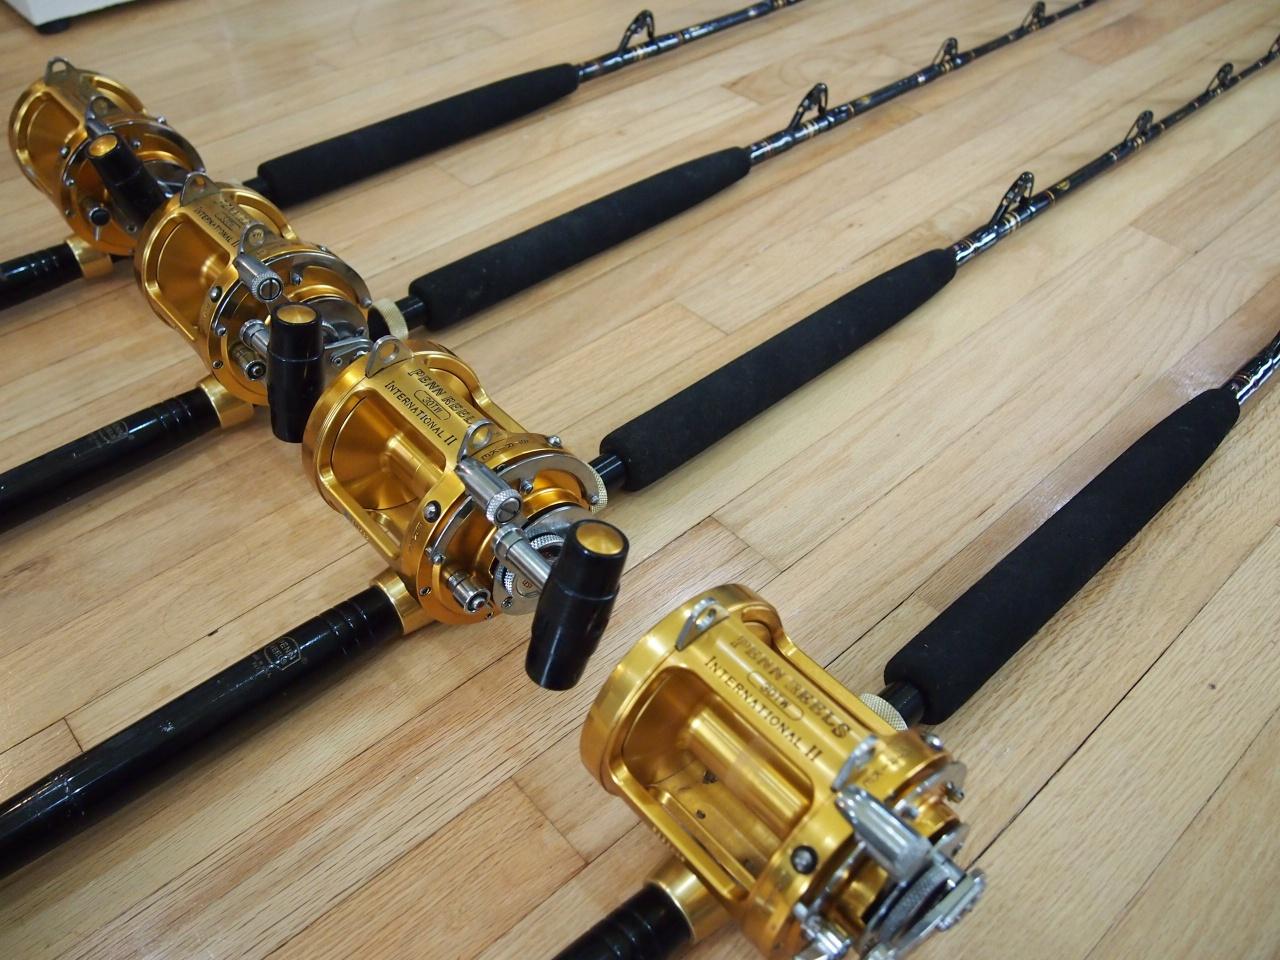 Penn & Shimano Reels, lots of rods - Pensacola Fishing Forum